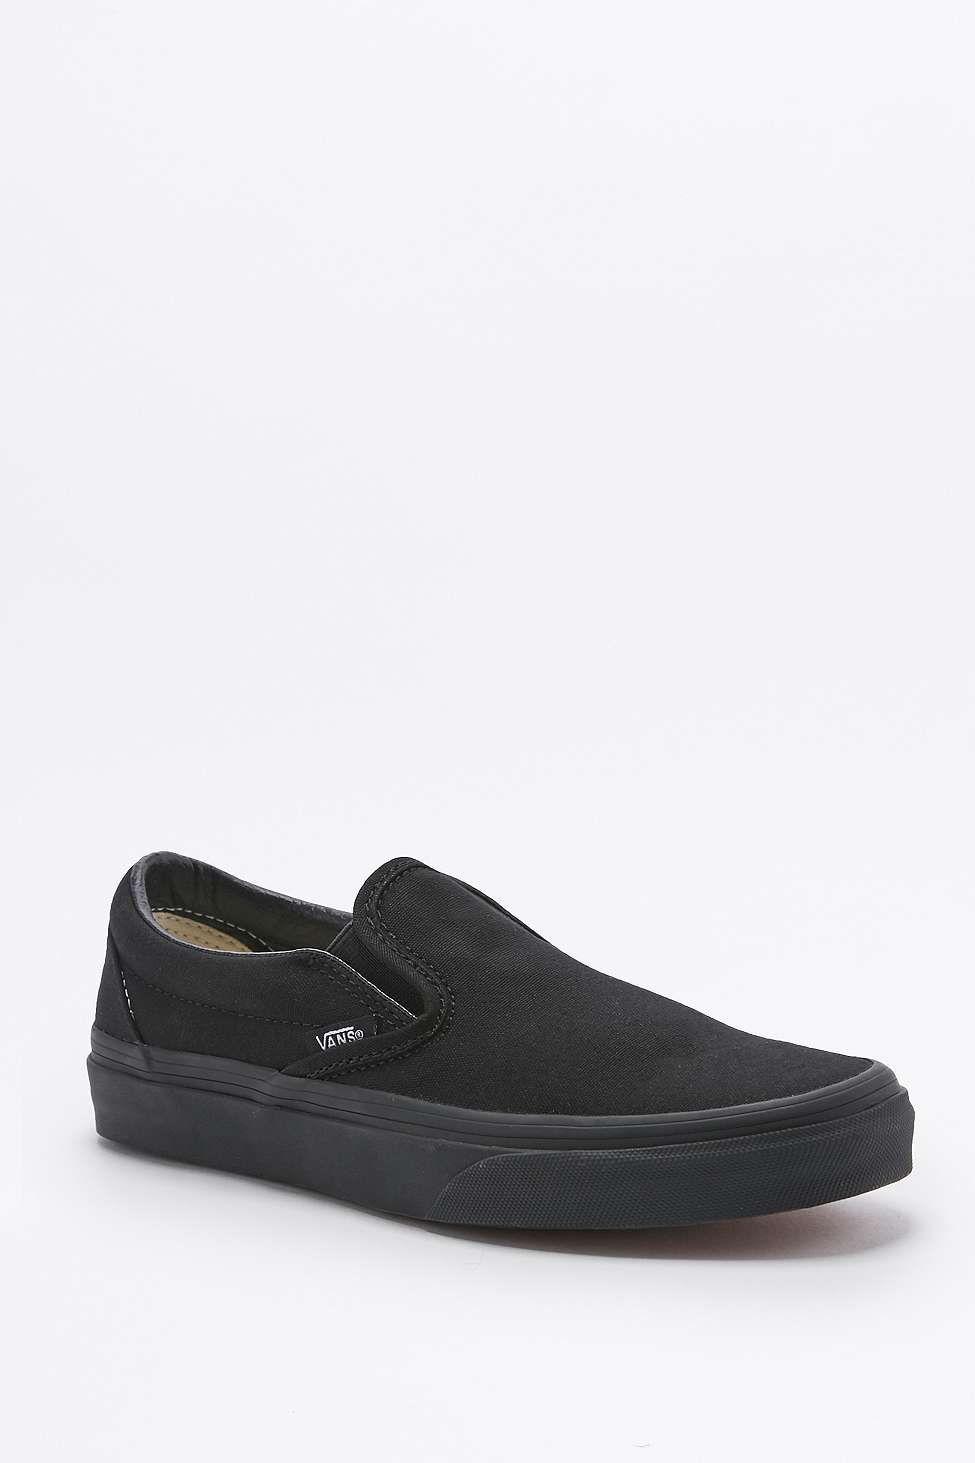 Vans Classic All Black Slip-On Trainers | Soulier et Thé air max